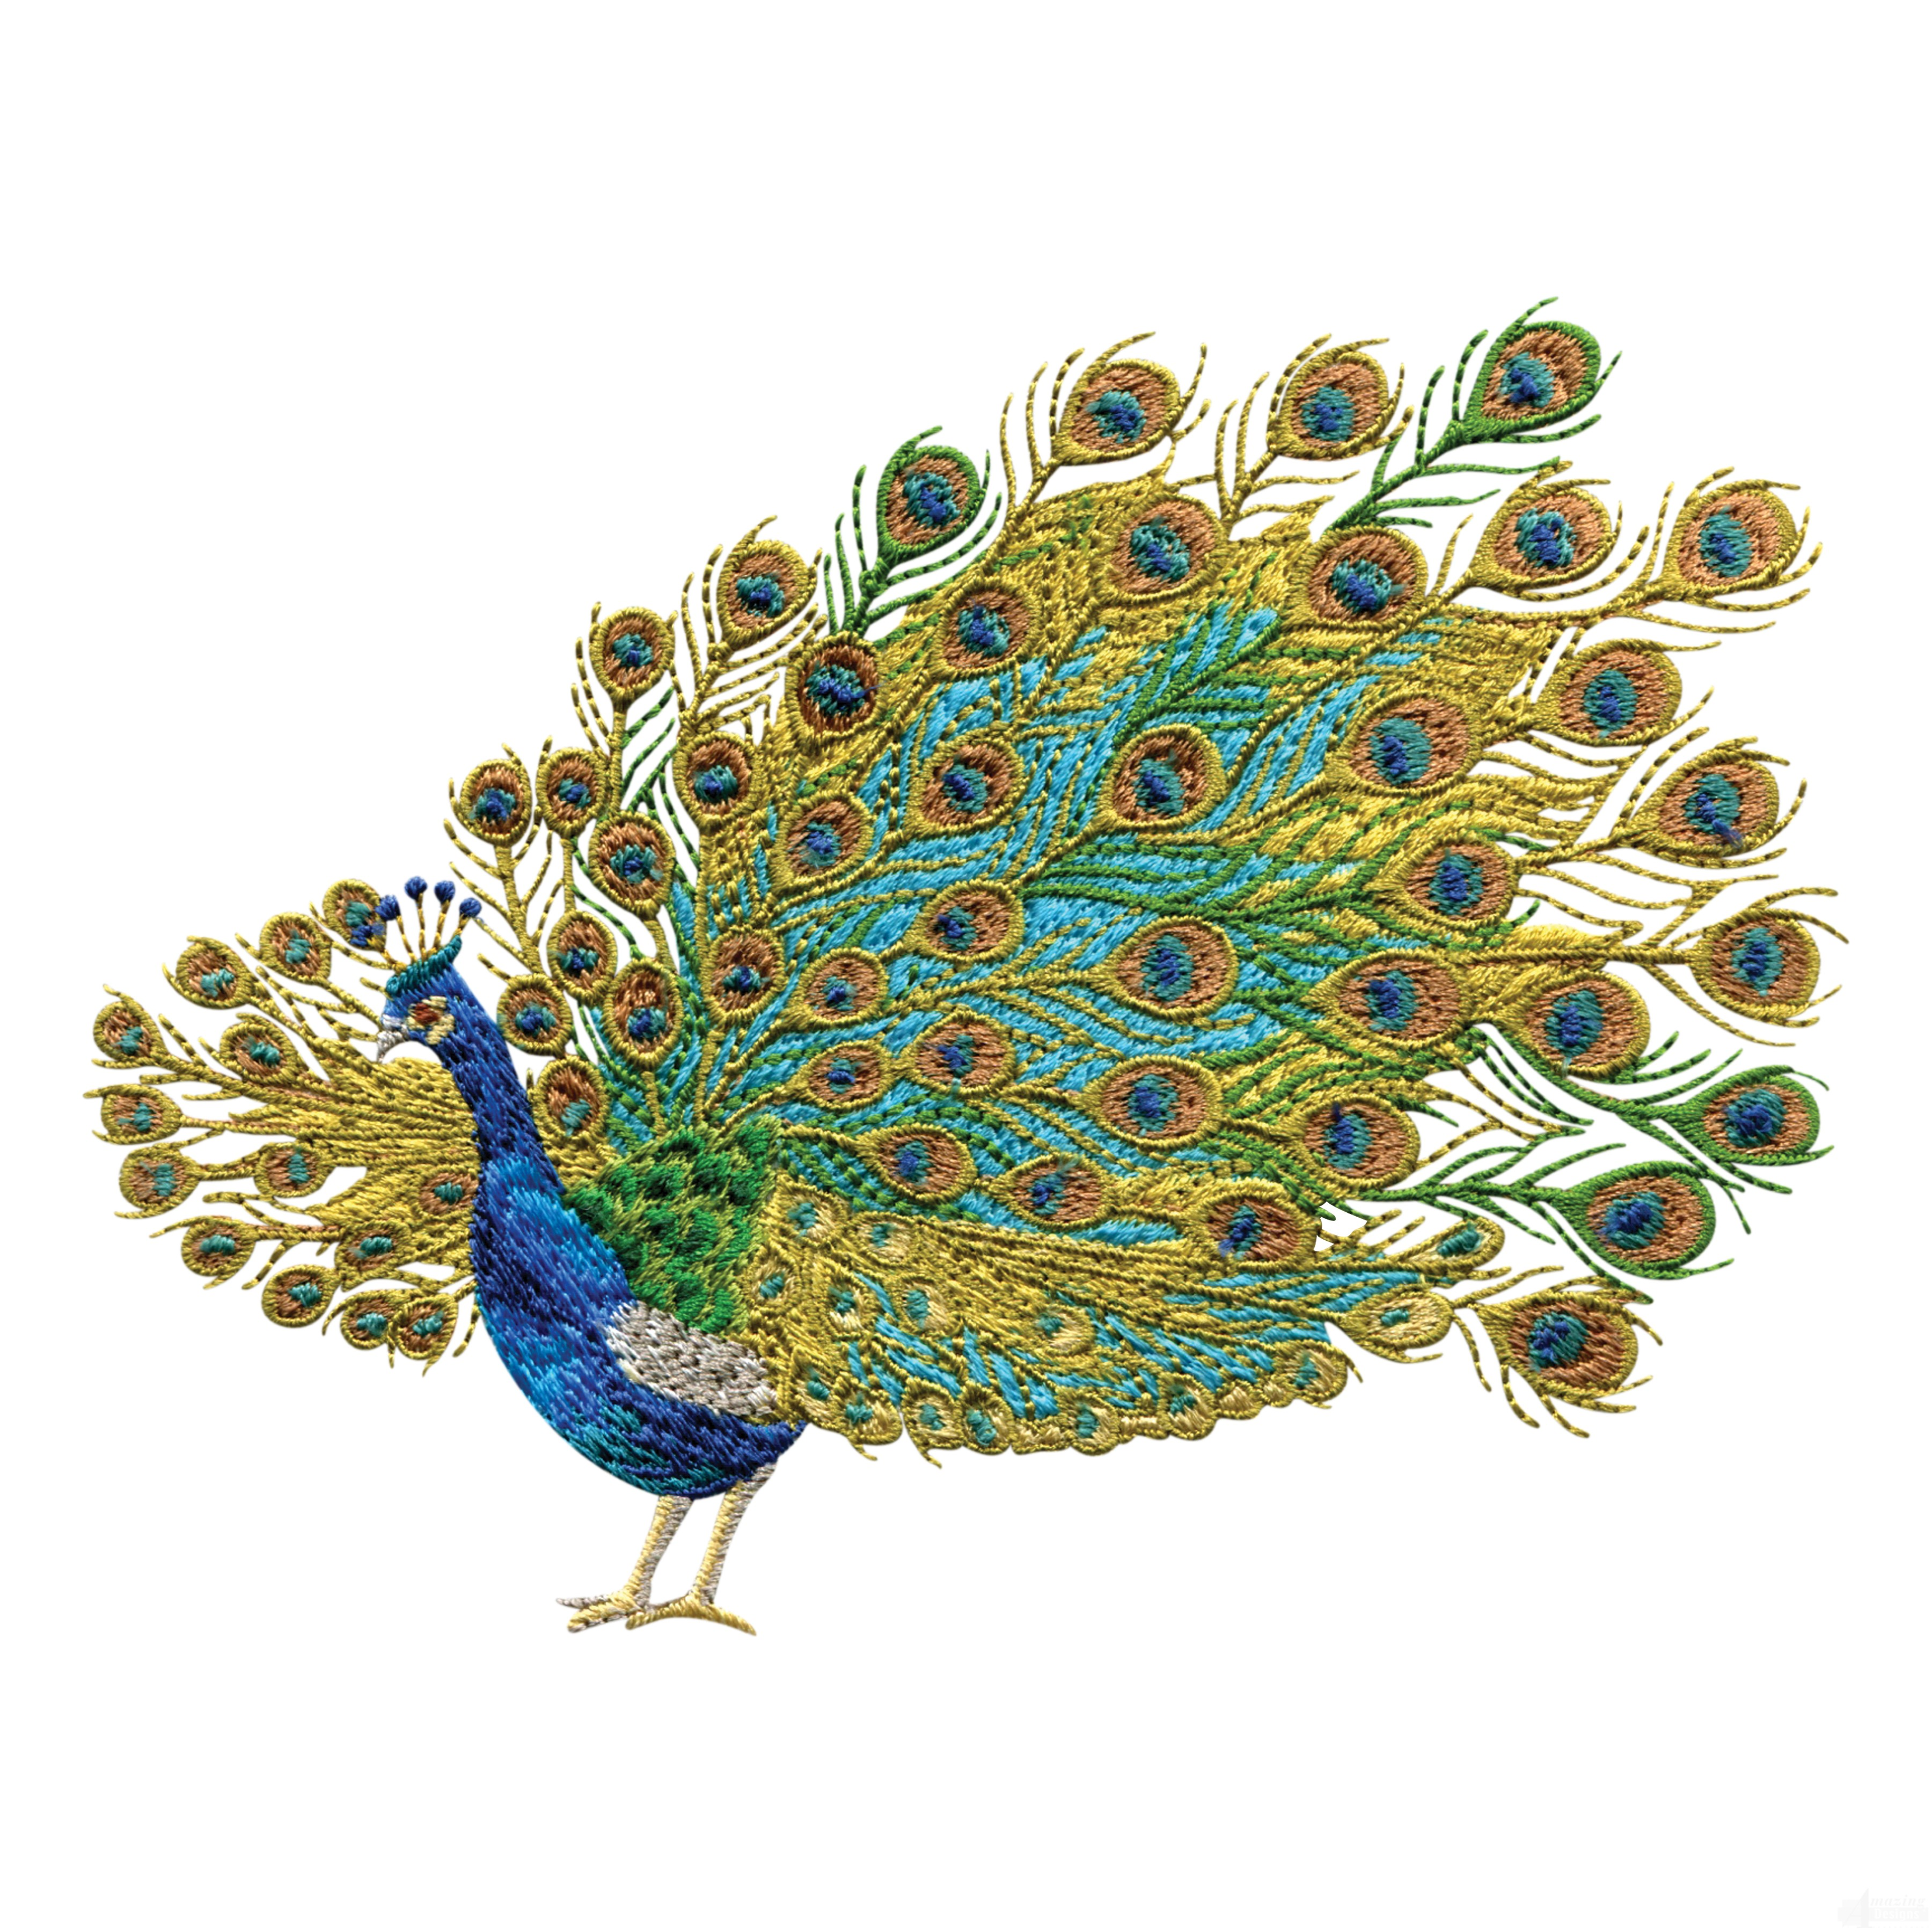 swnpa125 peacock embroidery design